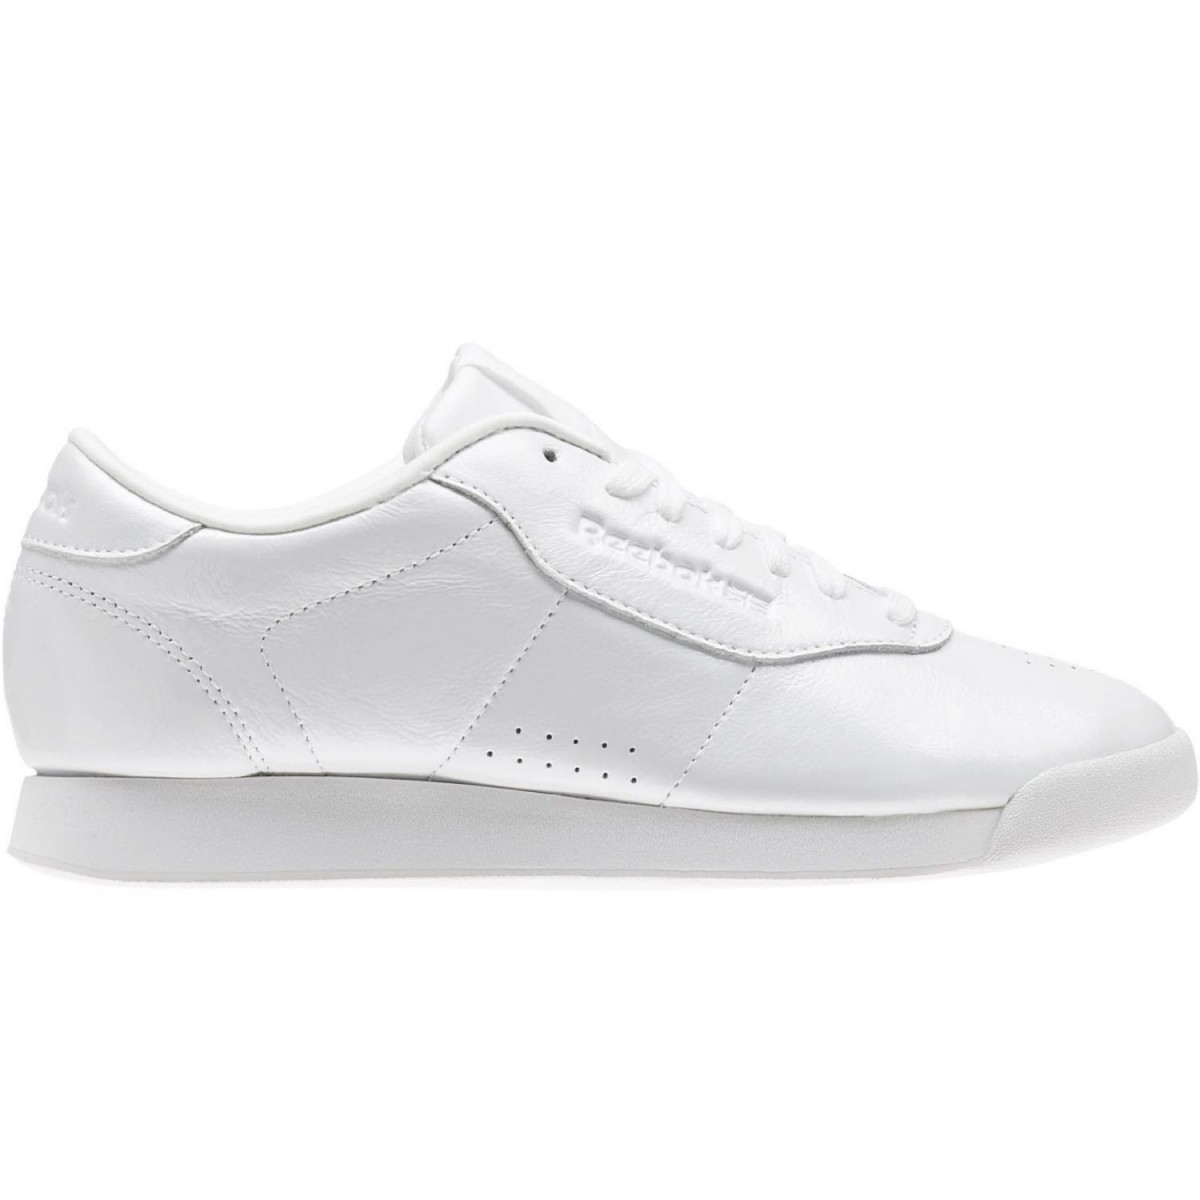 Reebok Princess Iridescent Sneaker